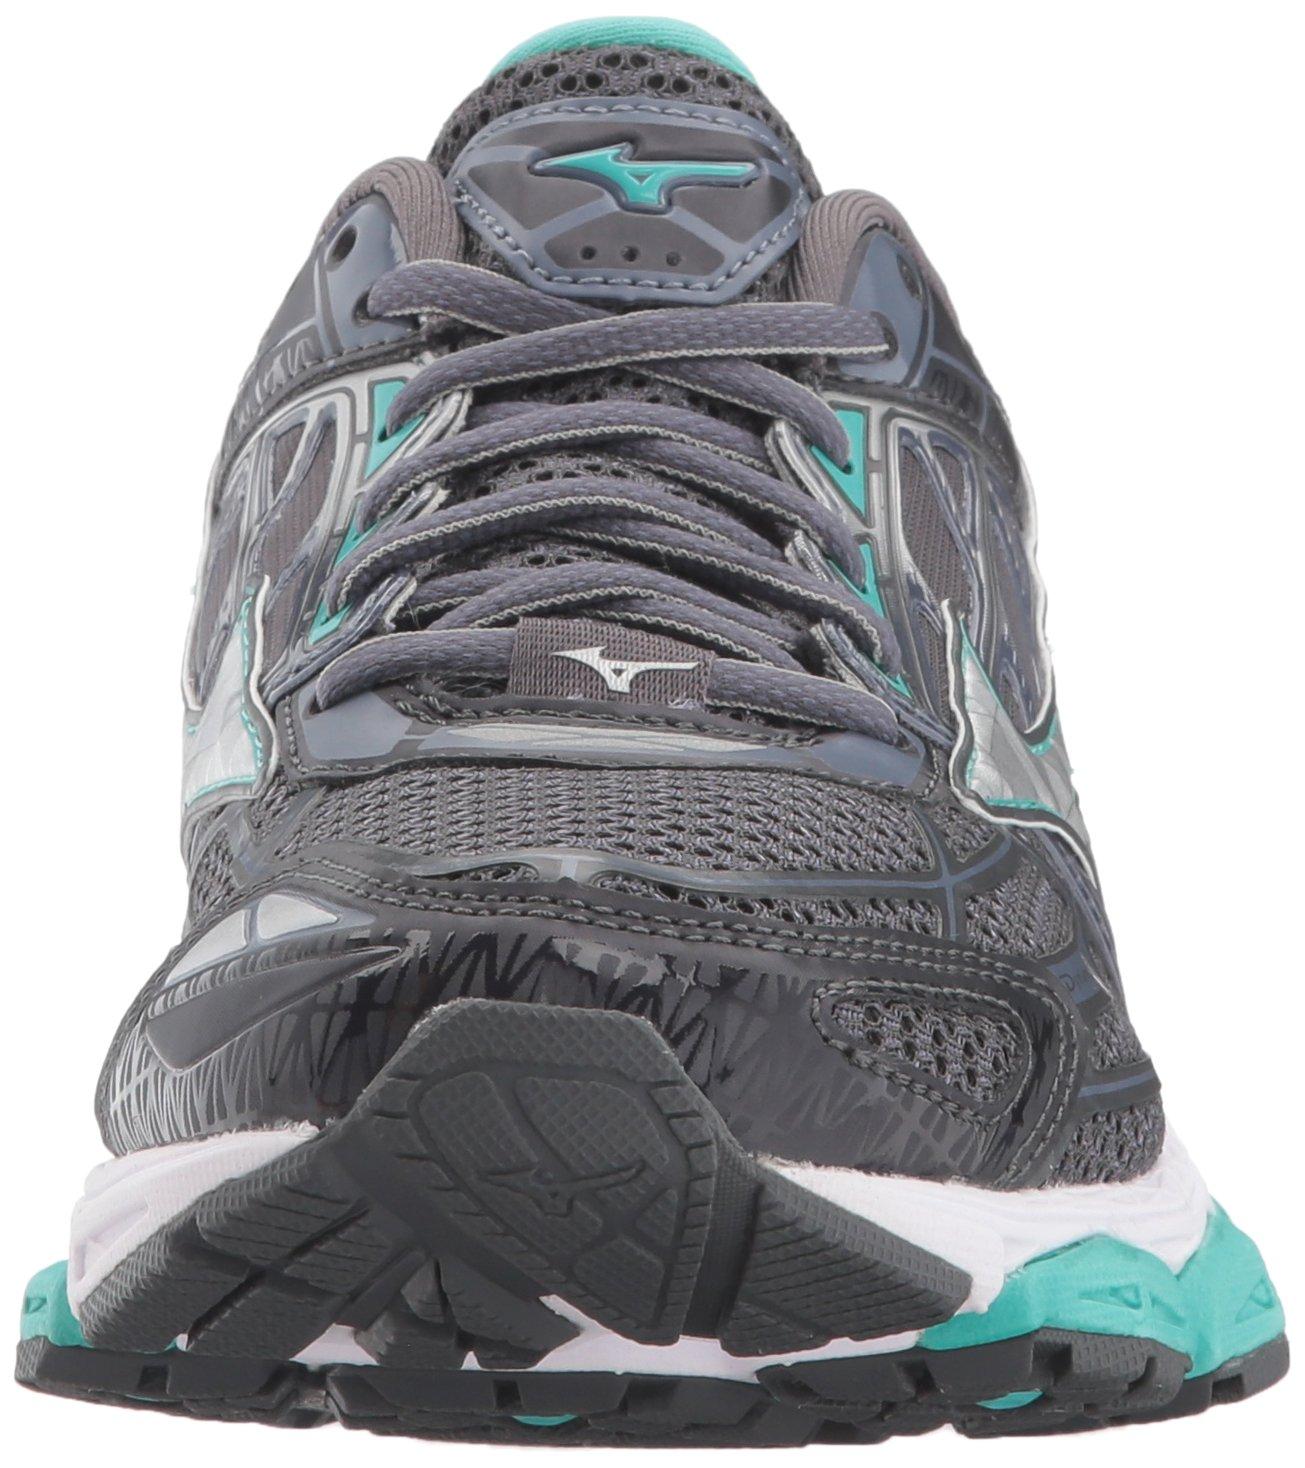 Mizuno Running Shoes Women's Wave Creation 19 Shoes Running B072DRMV2C 9 B(M) US|Magnet/Silver b7b6a4